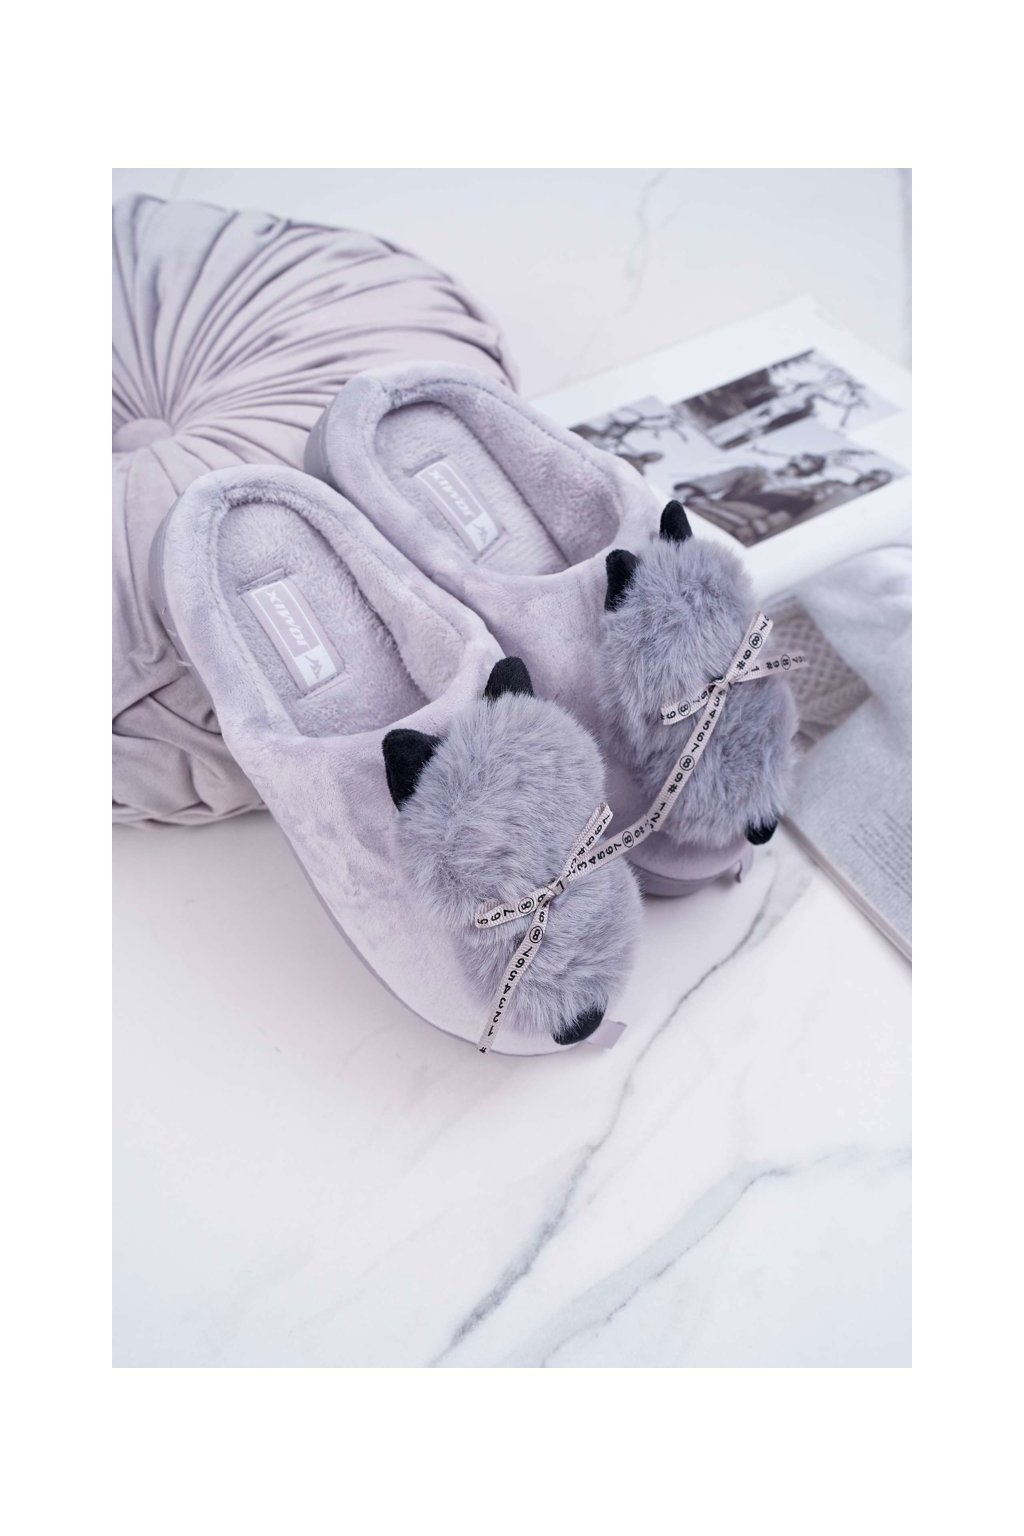 Dámske papuče s kožušinou kocour sivé Kitty